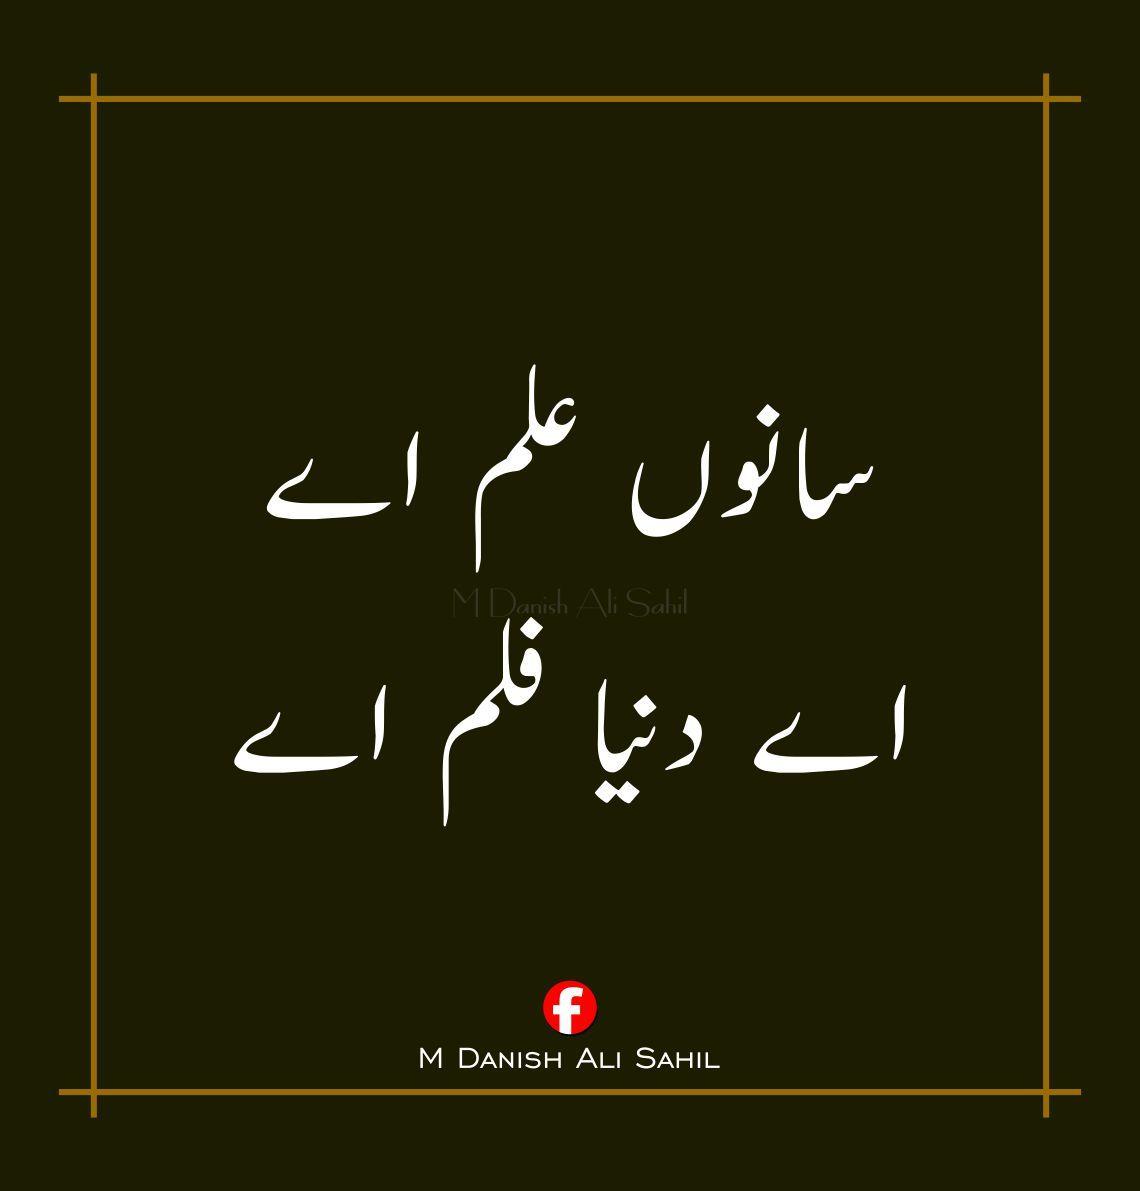 Design Islamic Urdu Quotes Quotes Images Pictures Best Collection Zindagi About Life Best Urdu Ame Fun Quotes Funny Funny Quotes In Urdu Funny Quotes